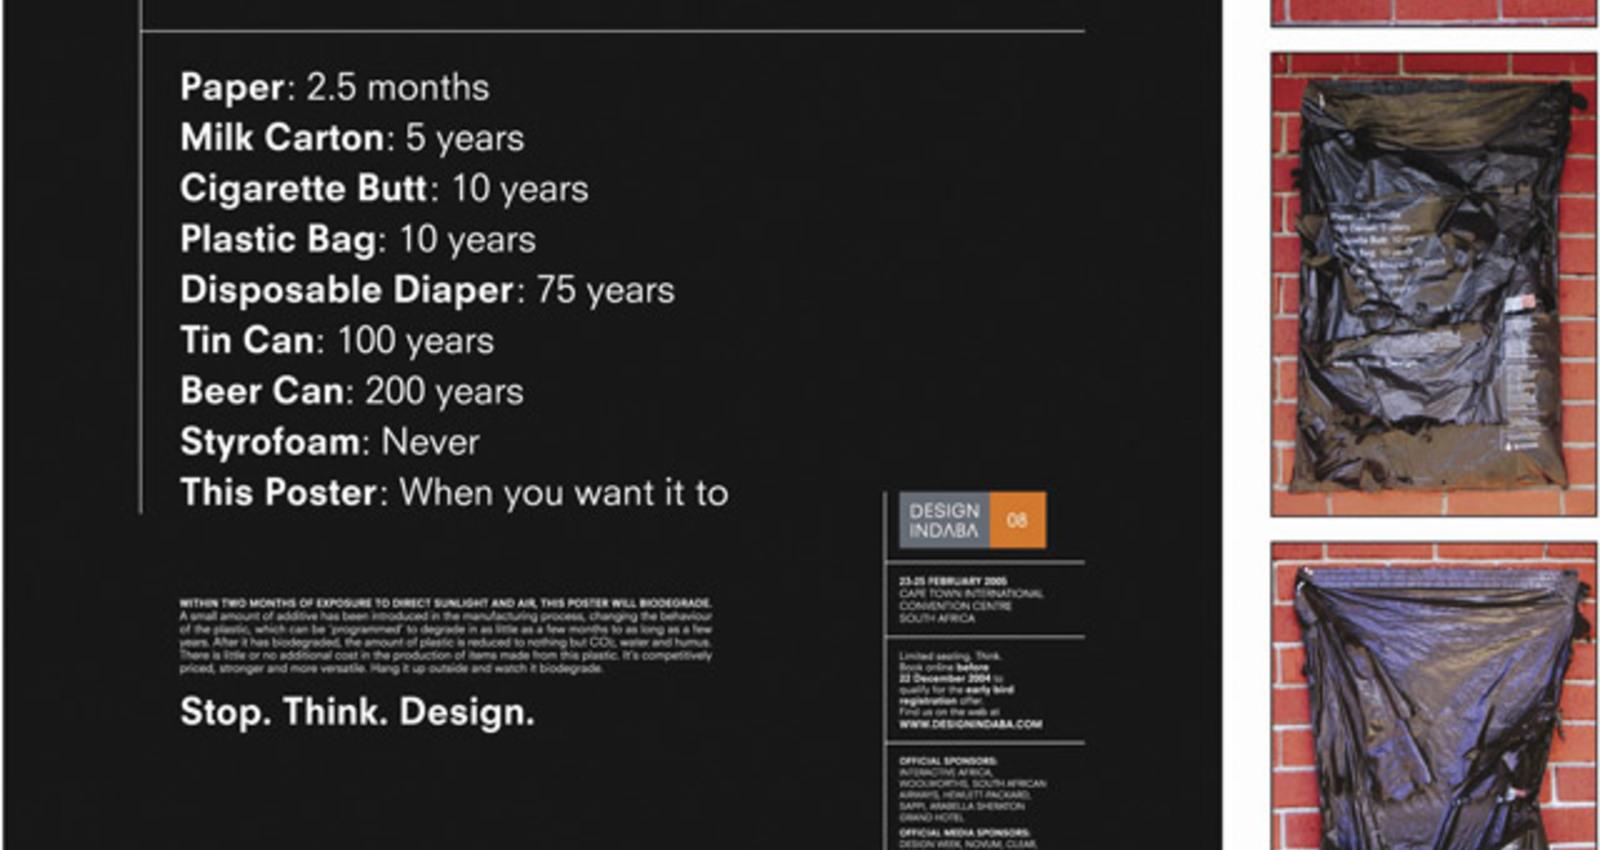 Design Indaba 8